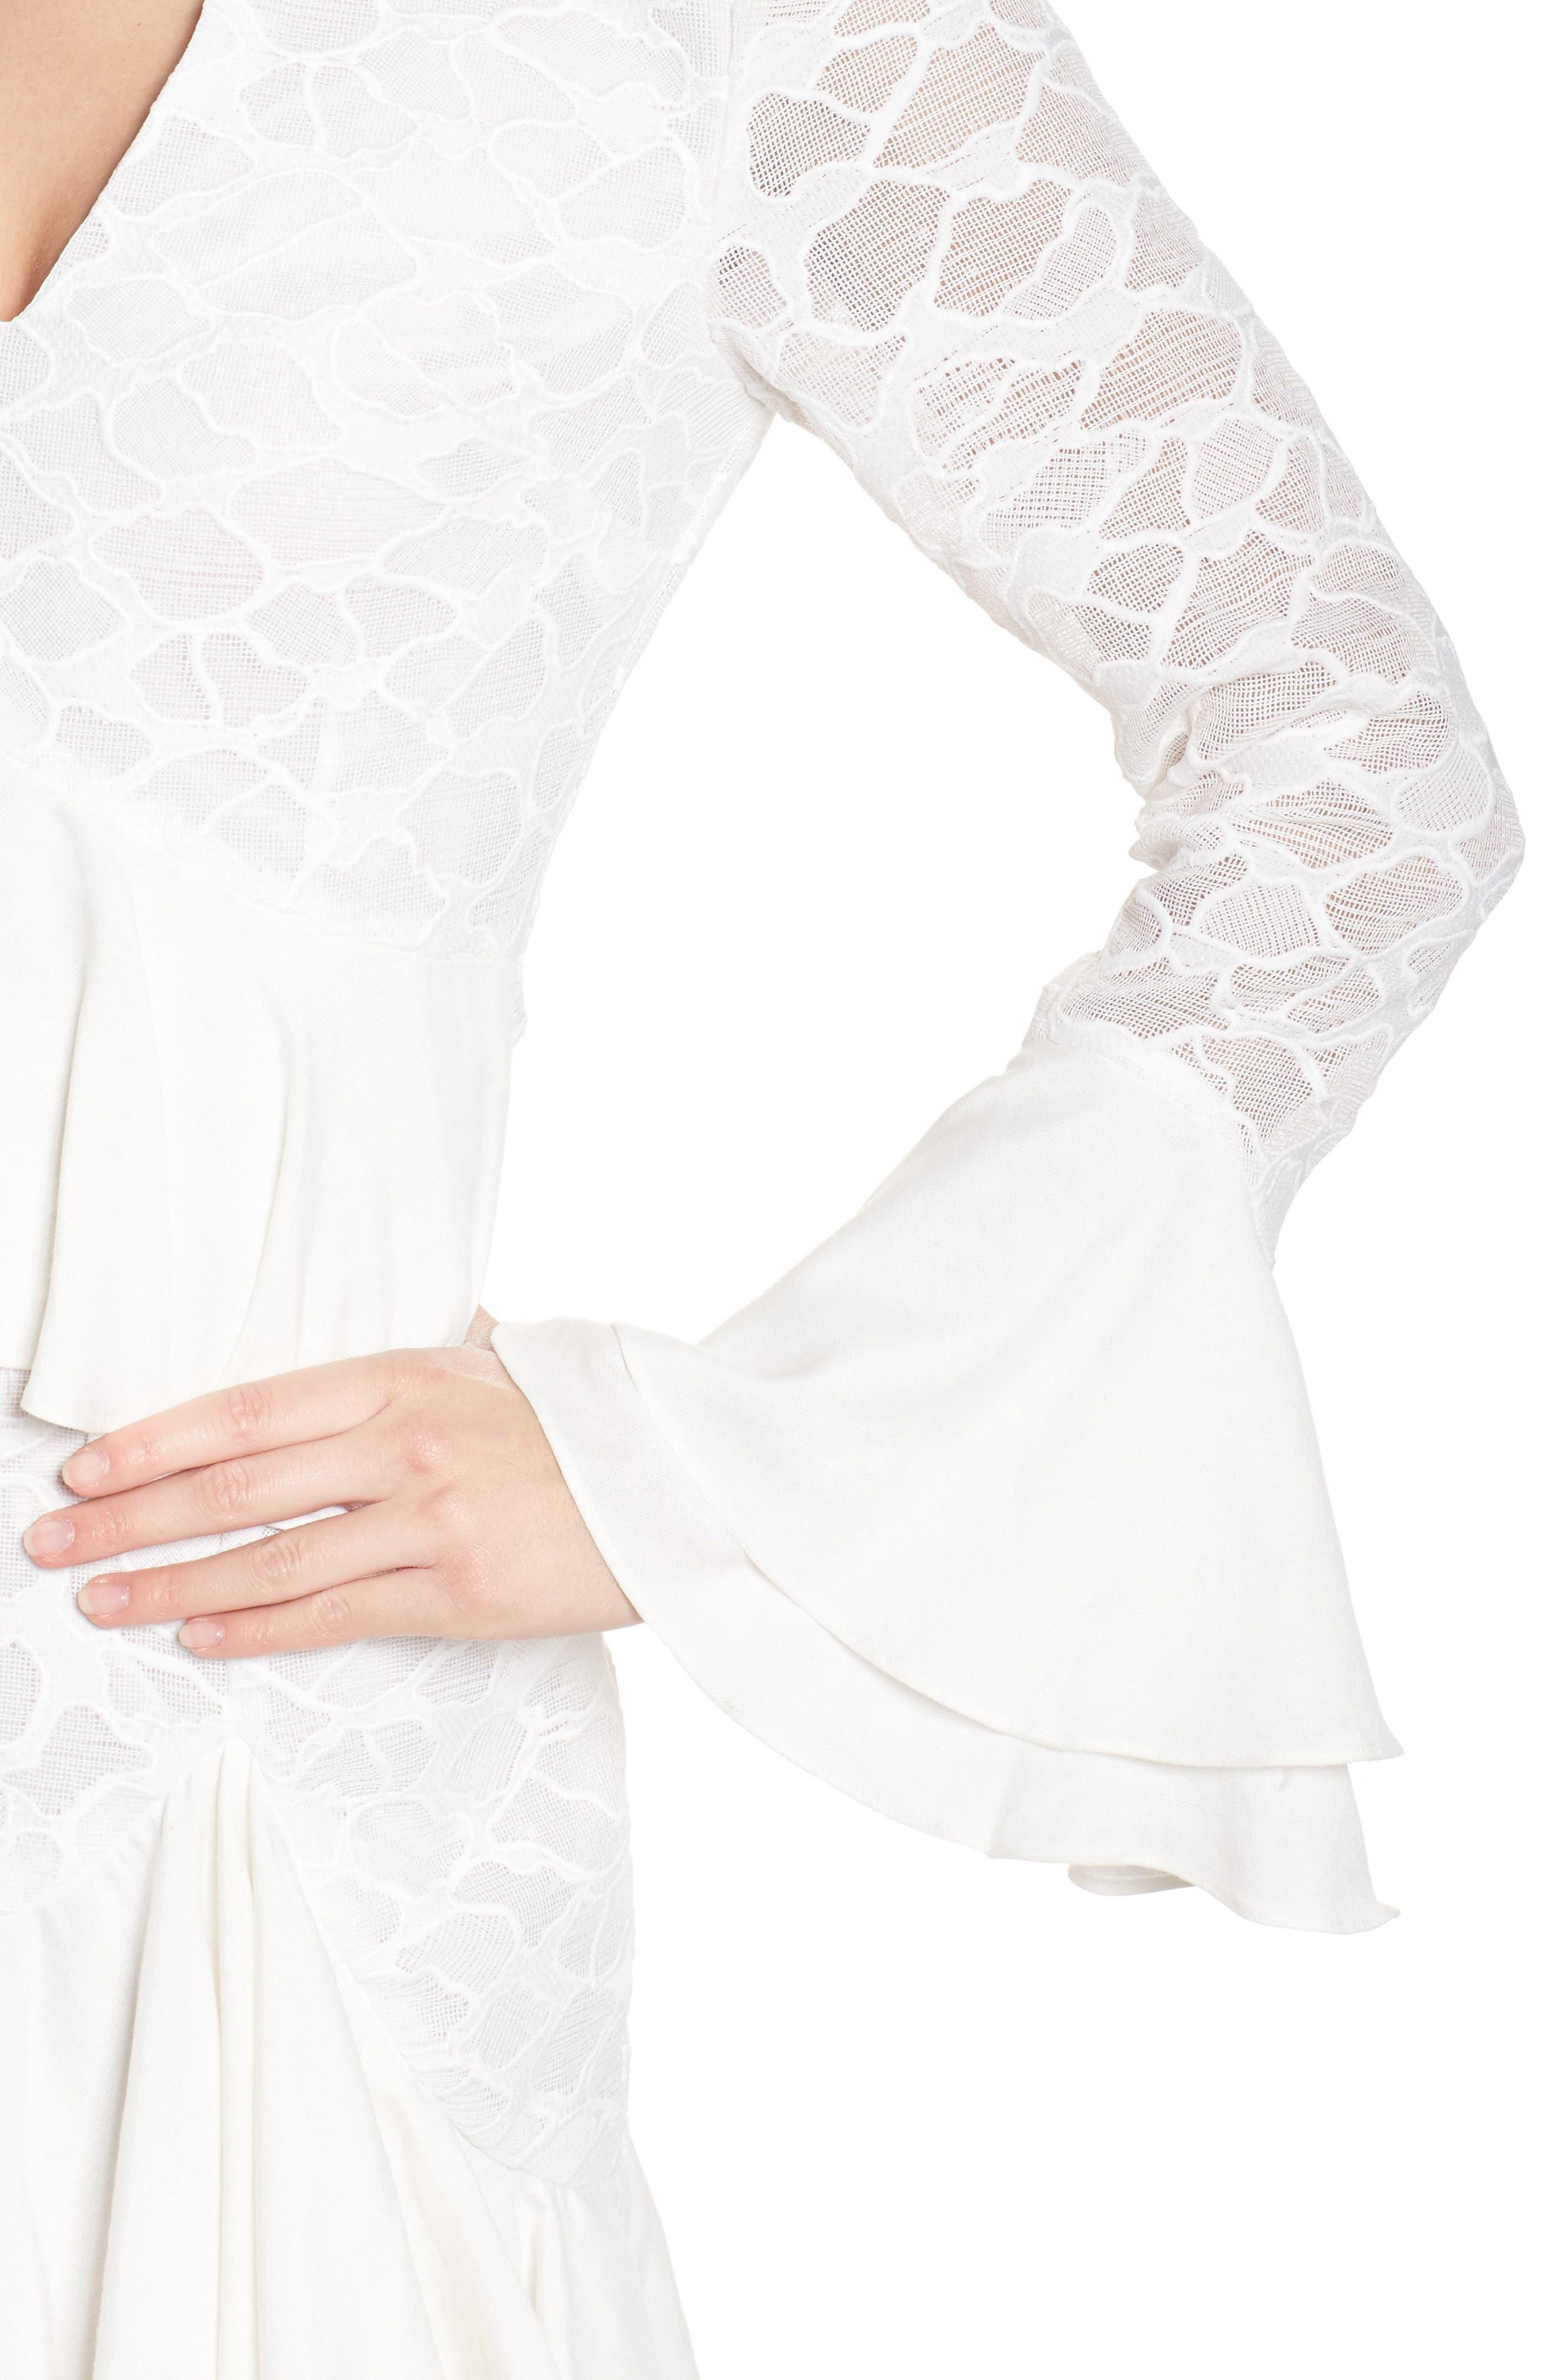 Phase Ruffle Lace Minidress,                             Alternate thumbnail 4, color,